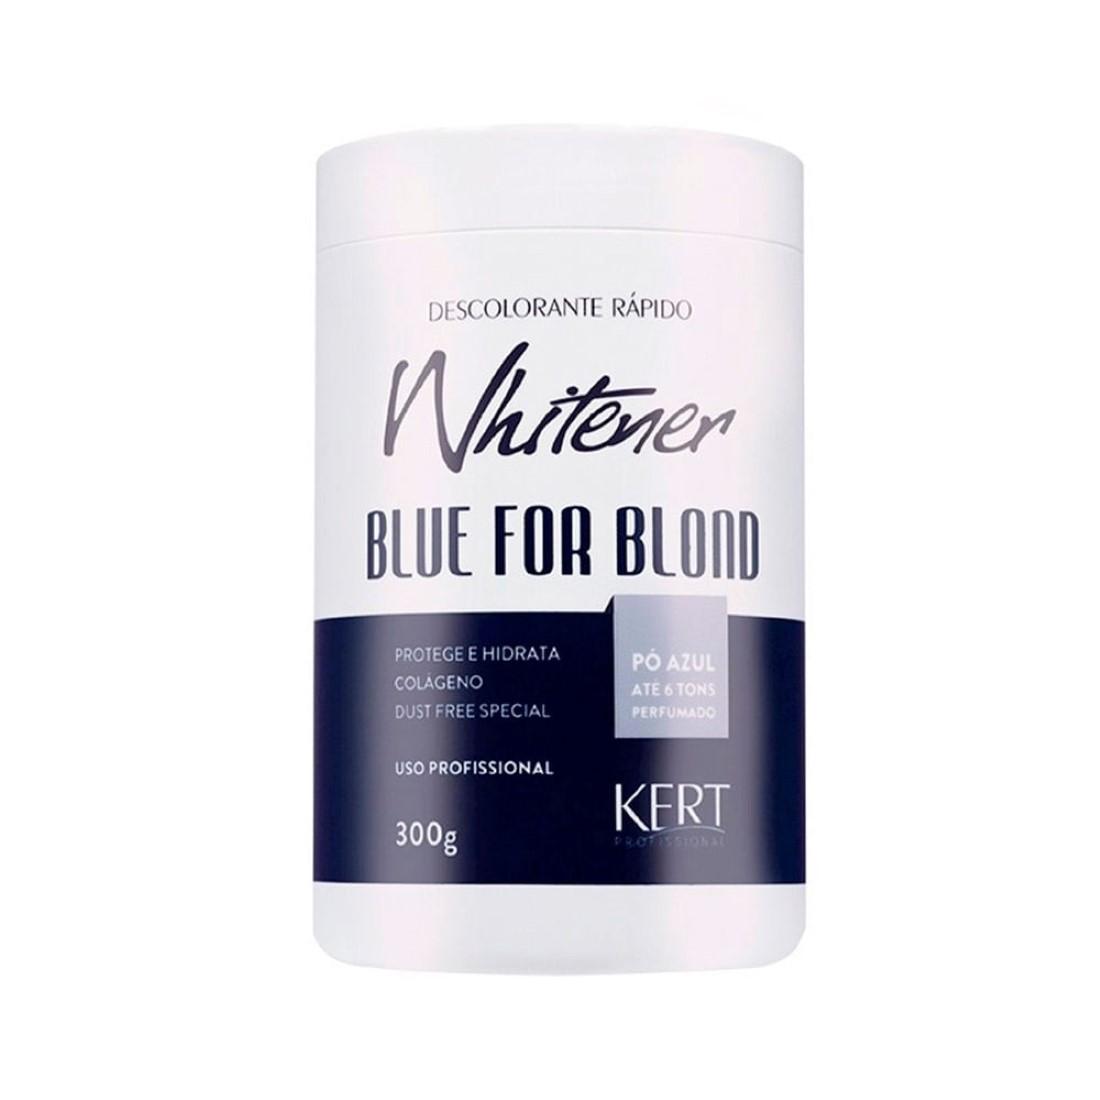 Pó Descolorante Whitener Blue for Blond 300g - Kert